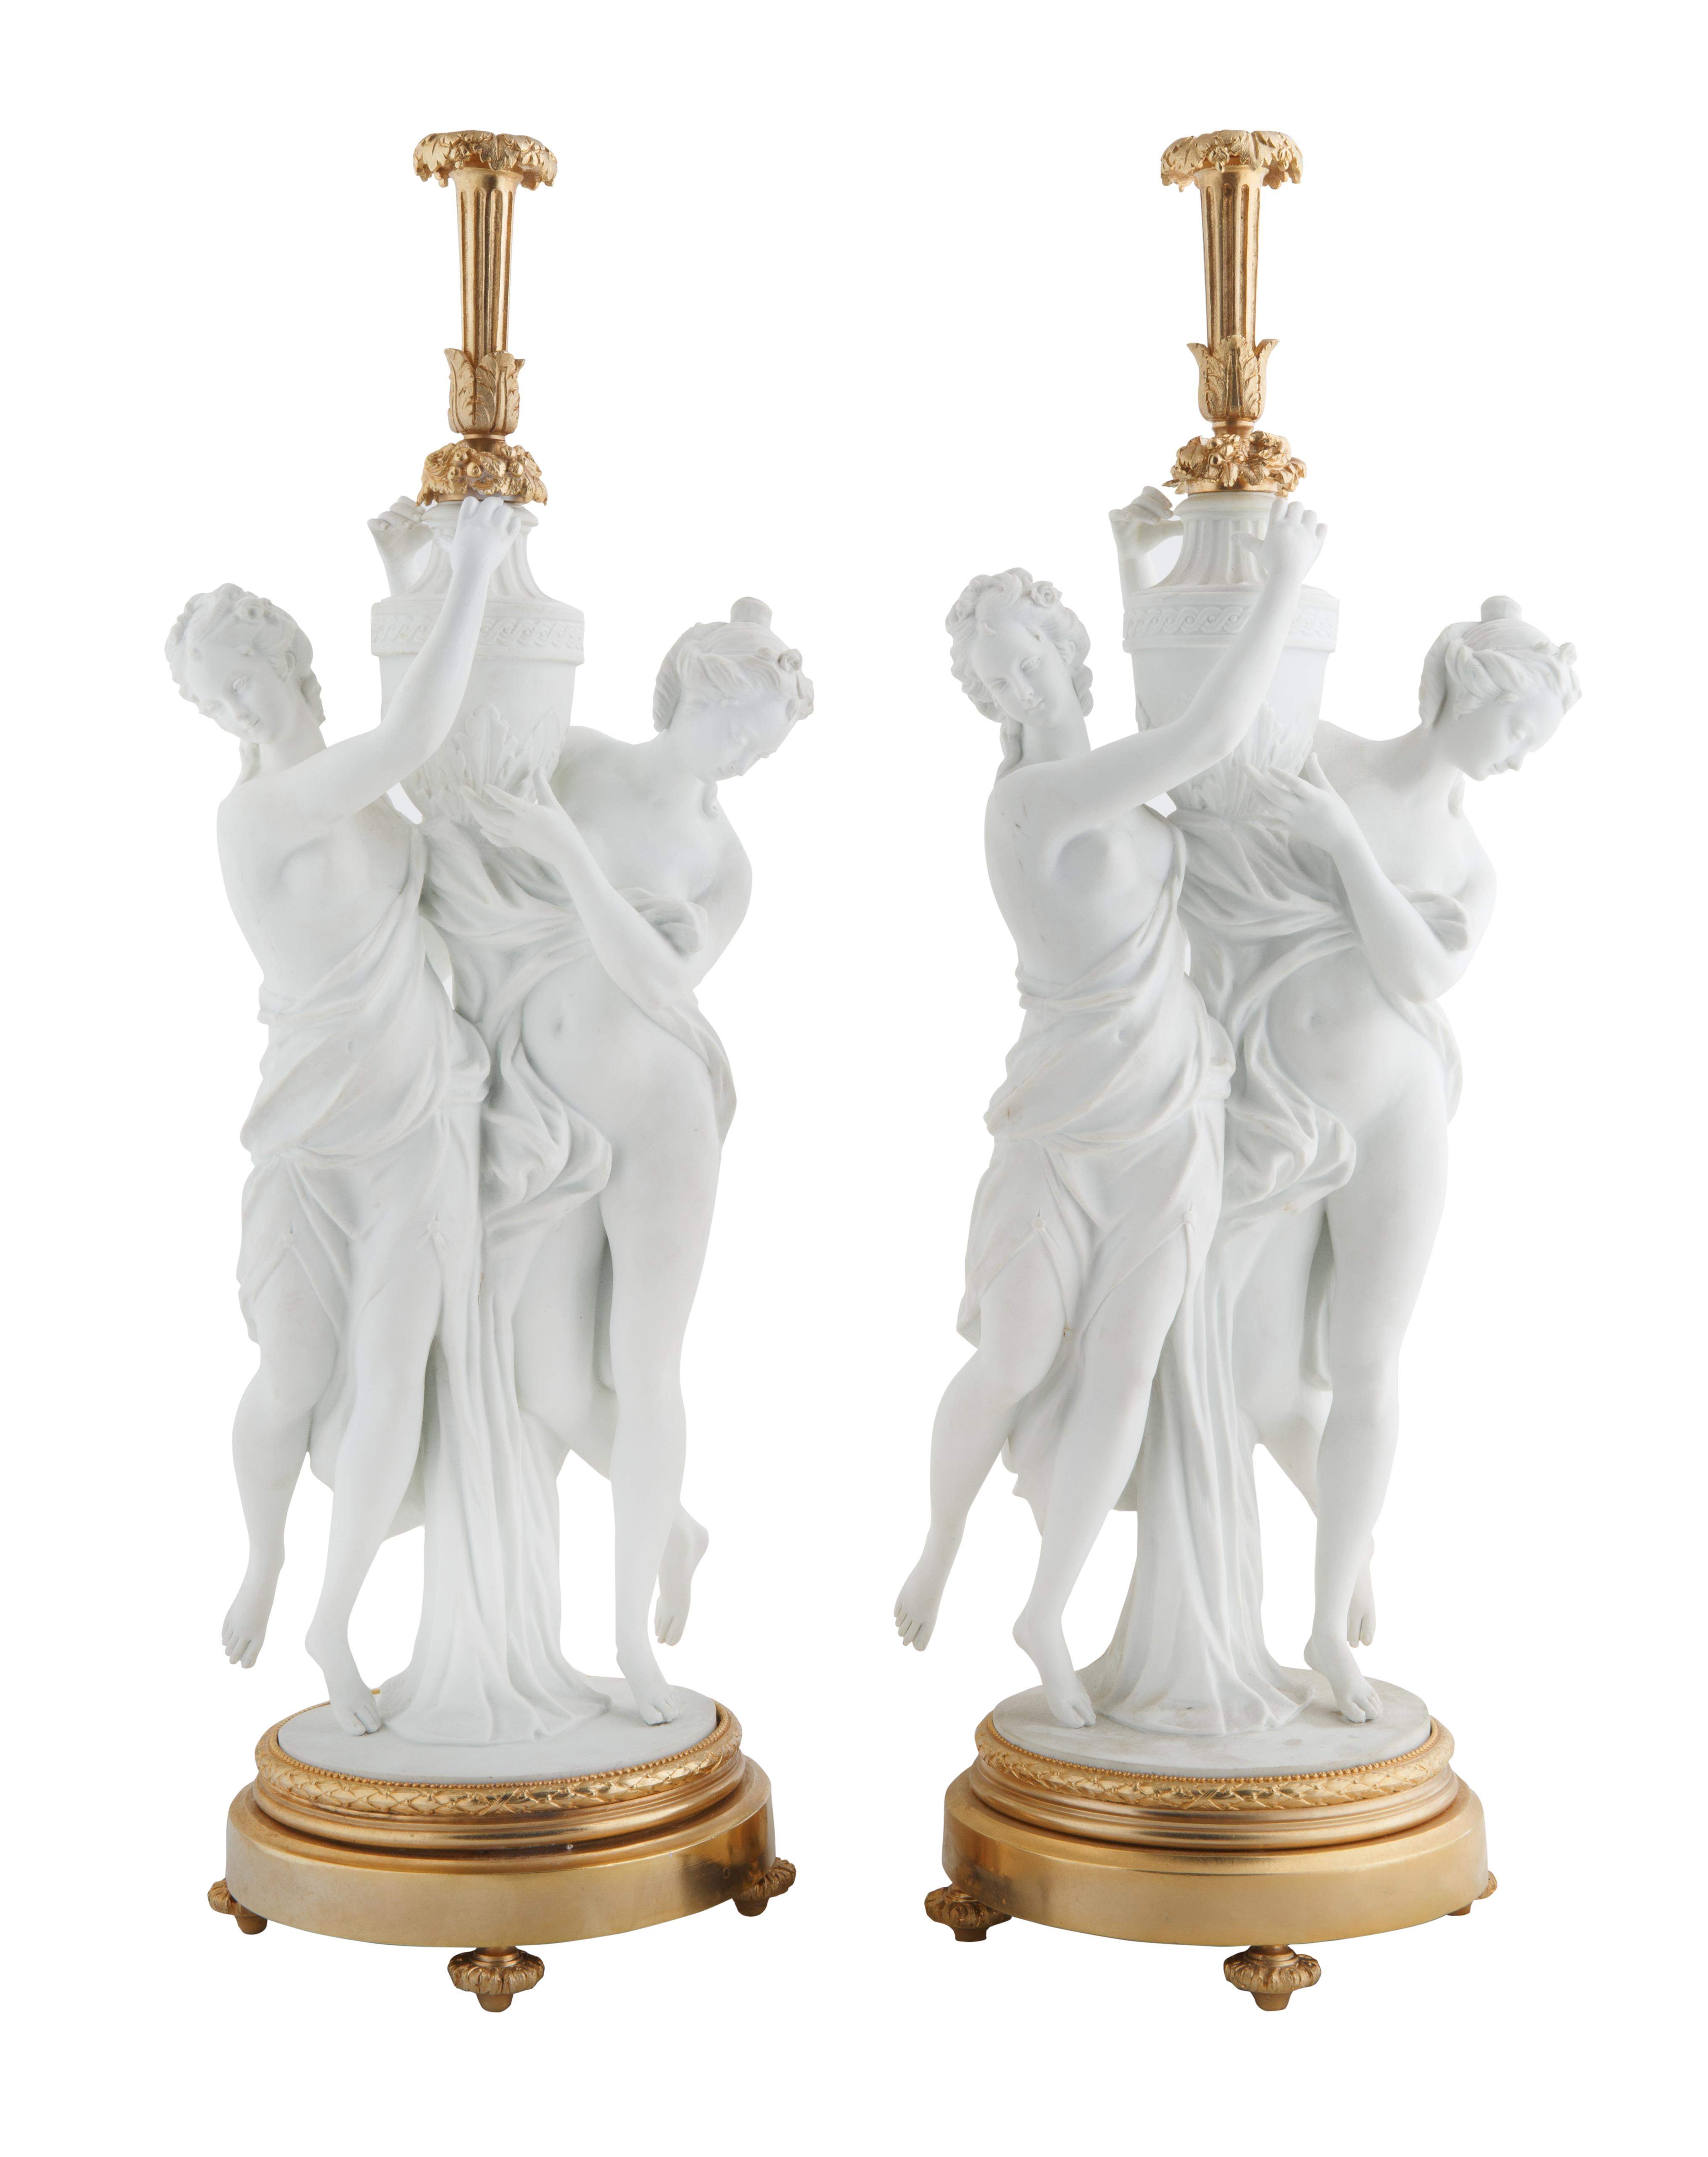 PAIR OF NEOCLASSICAL STYLE BISQUE CERAMIC MAIDEN LAMPS